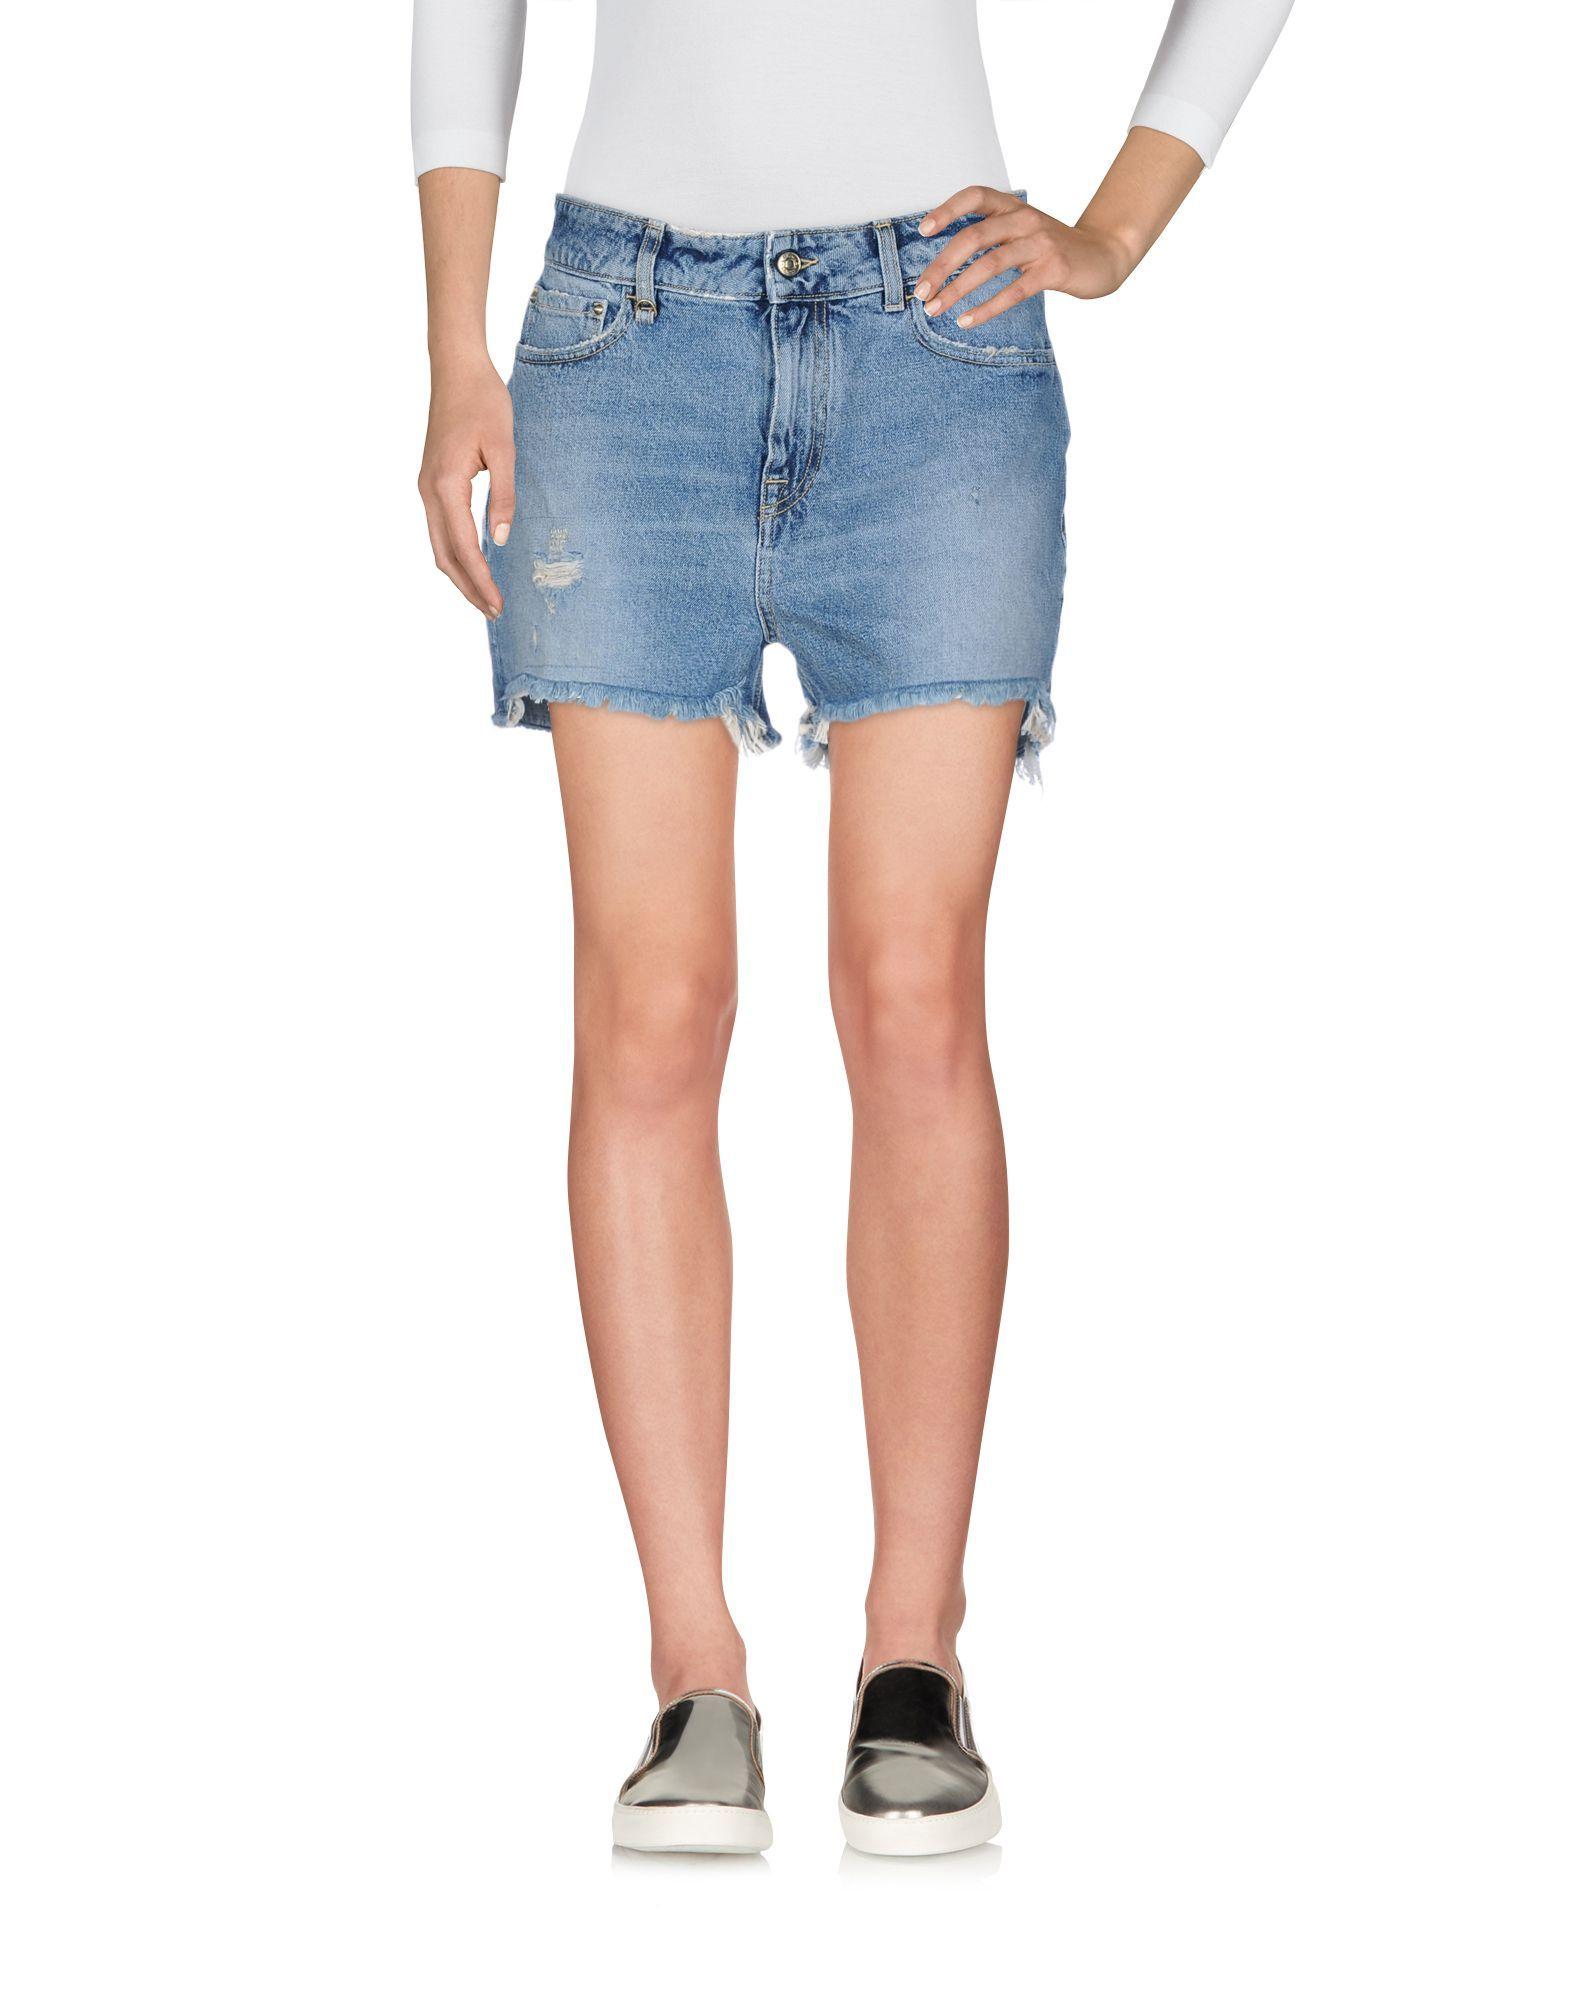 Cycle Blue Denim Shorts